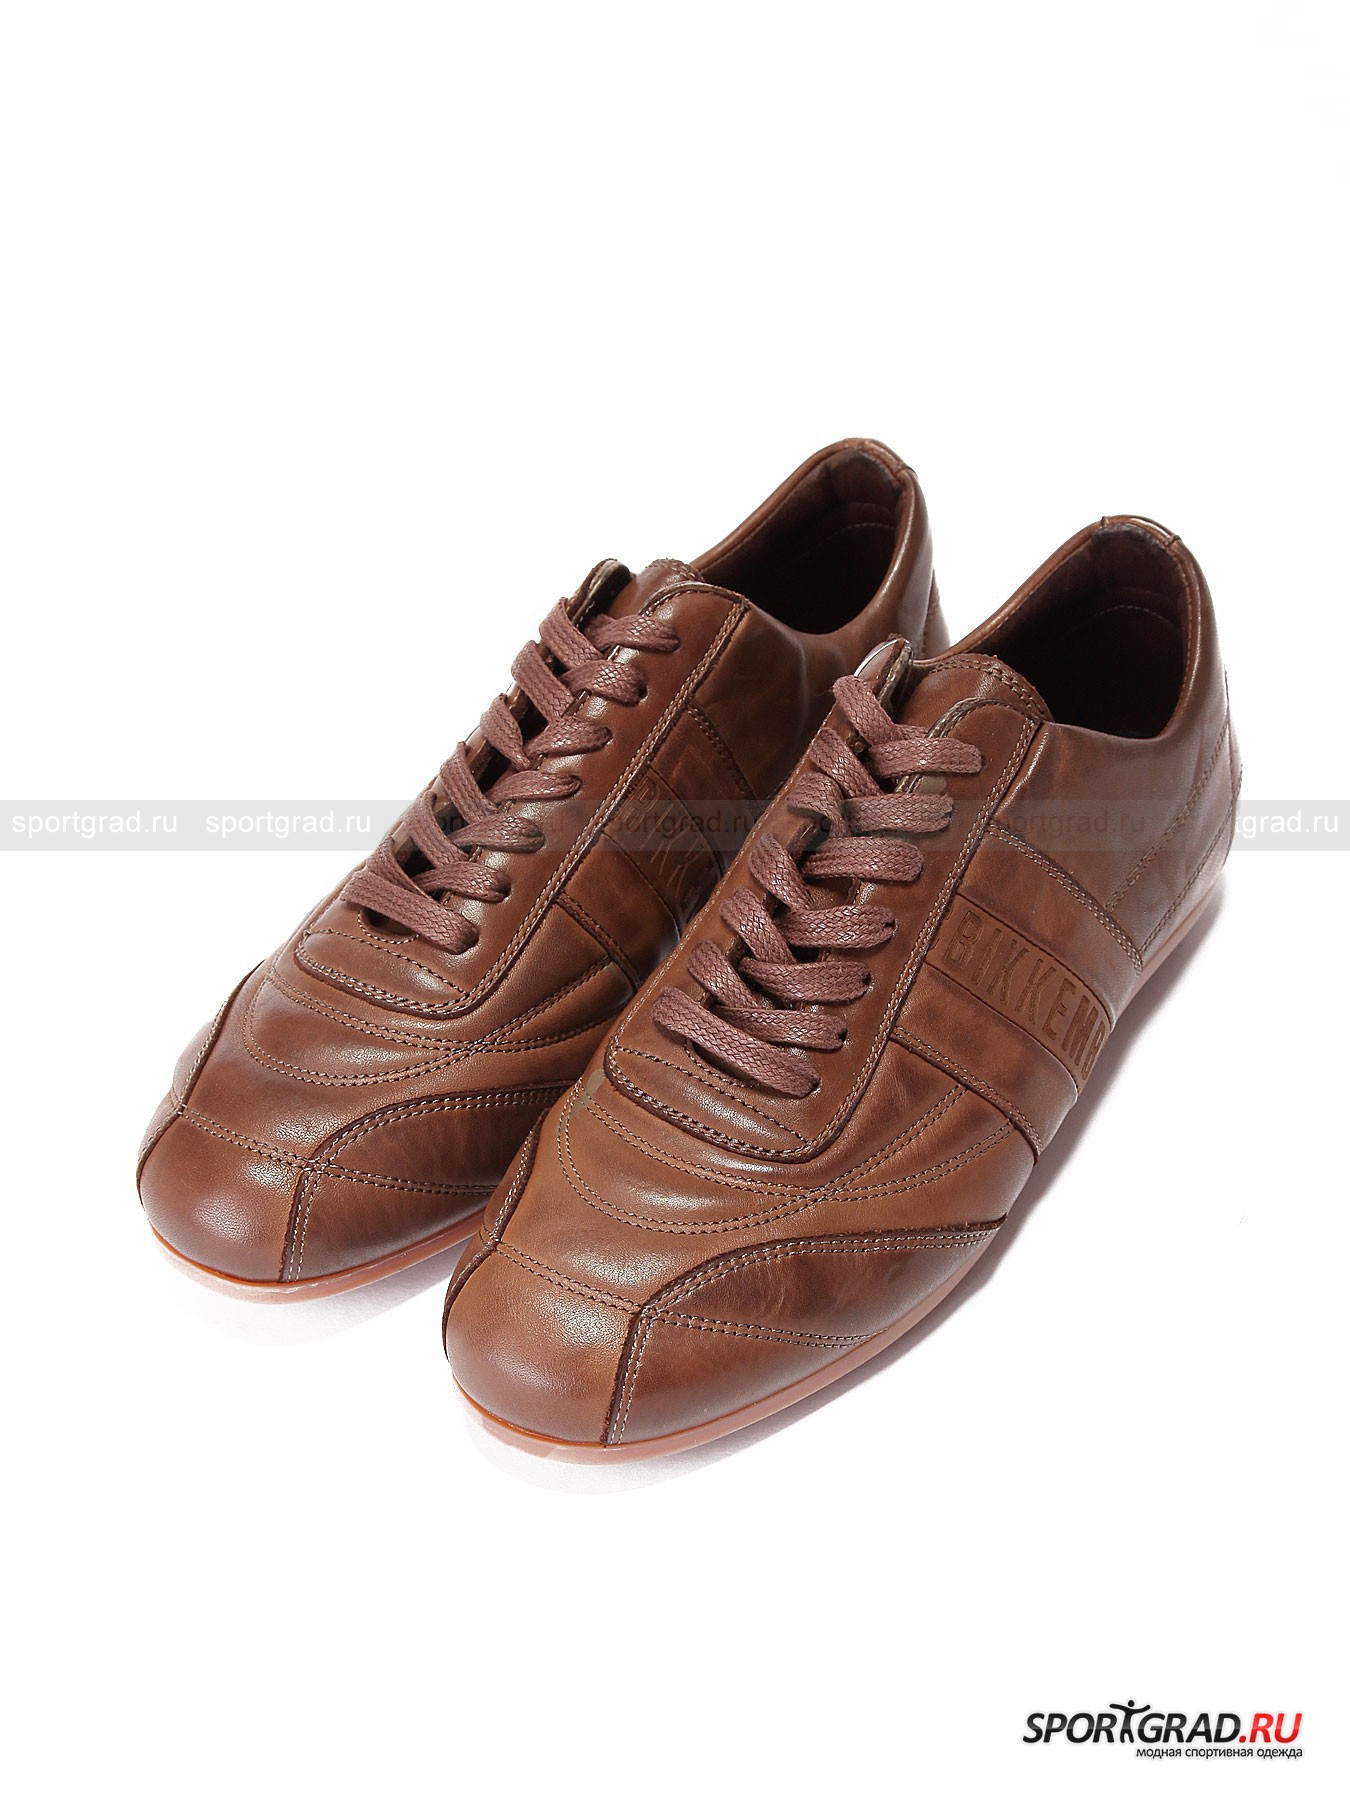 Кроссовки мужские Soccer 106 Leather BIKKEMBERGS